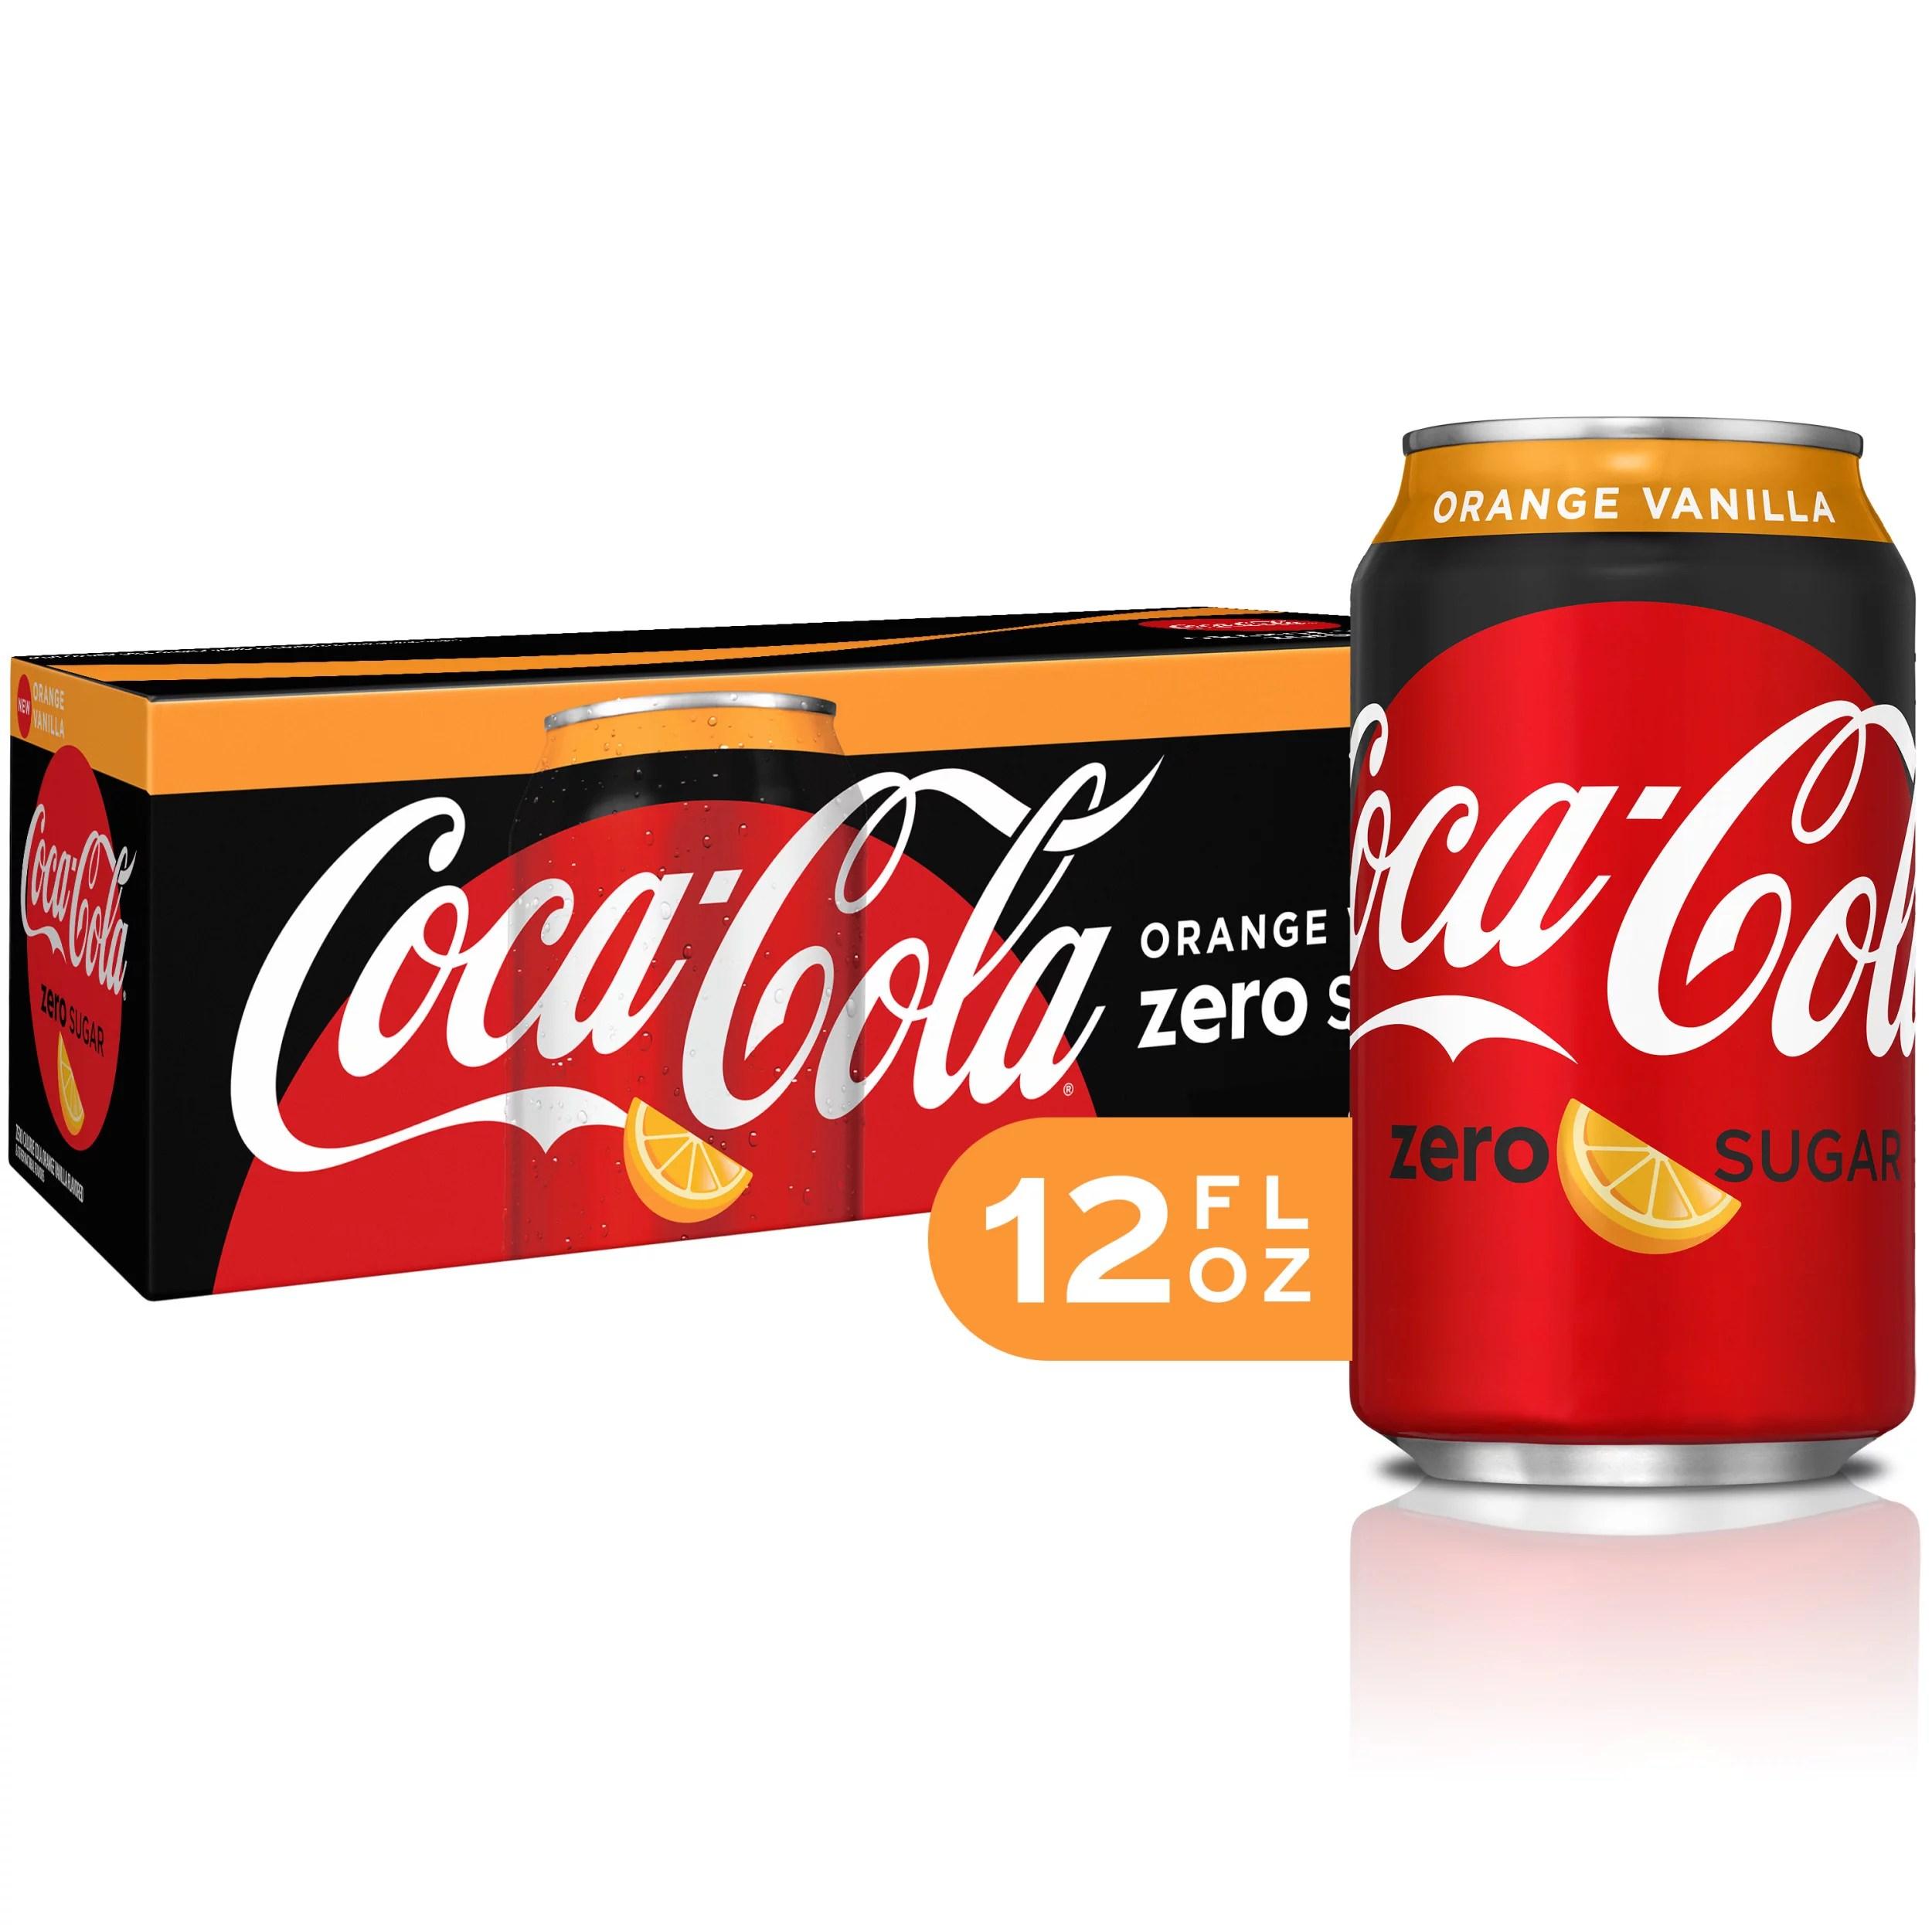 Coke Zero Orange Vanilla Diet Soda Sugar Free Soft Drinks ...